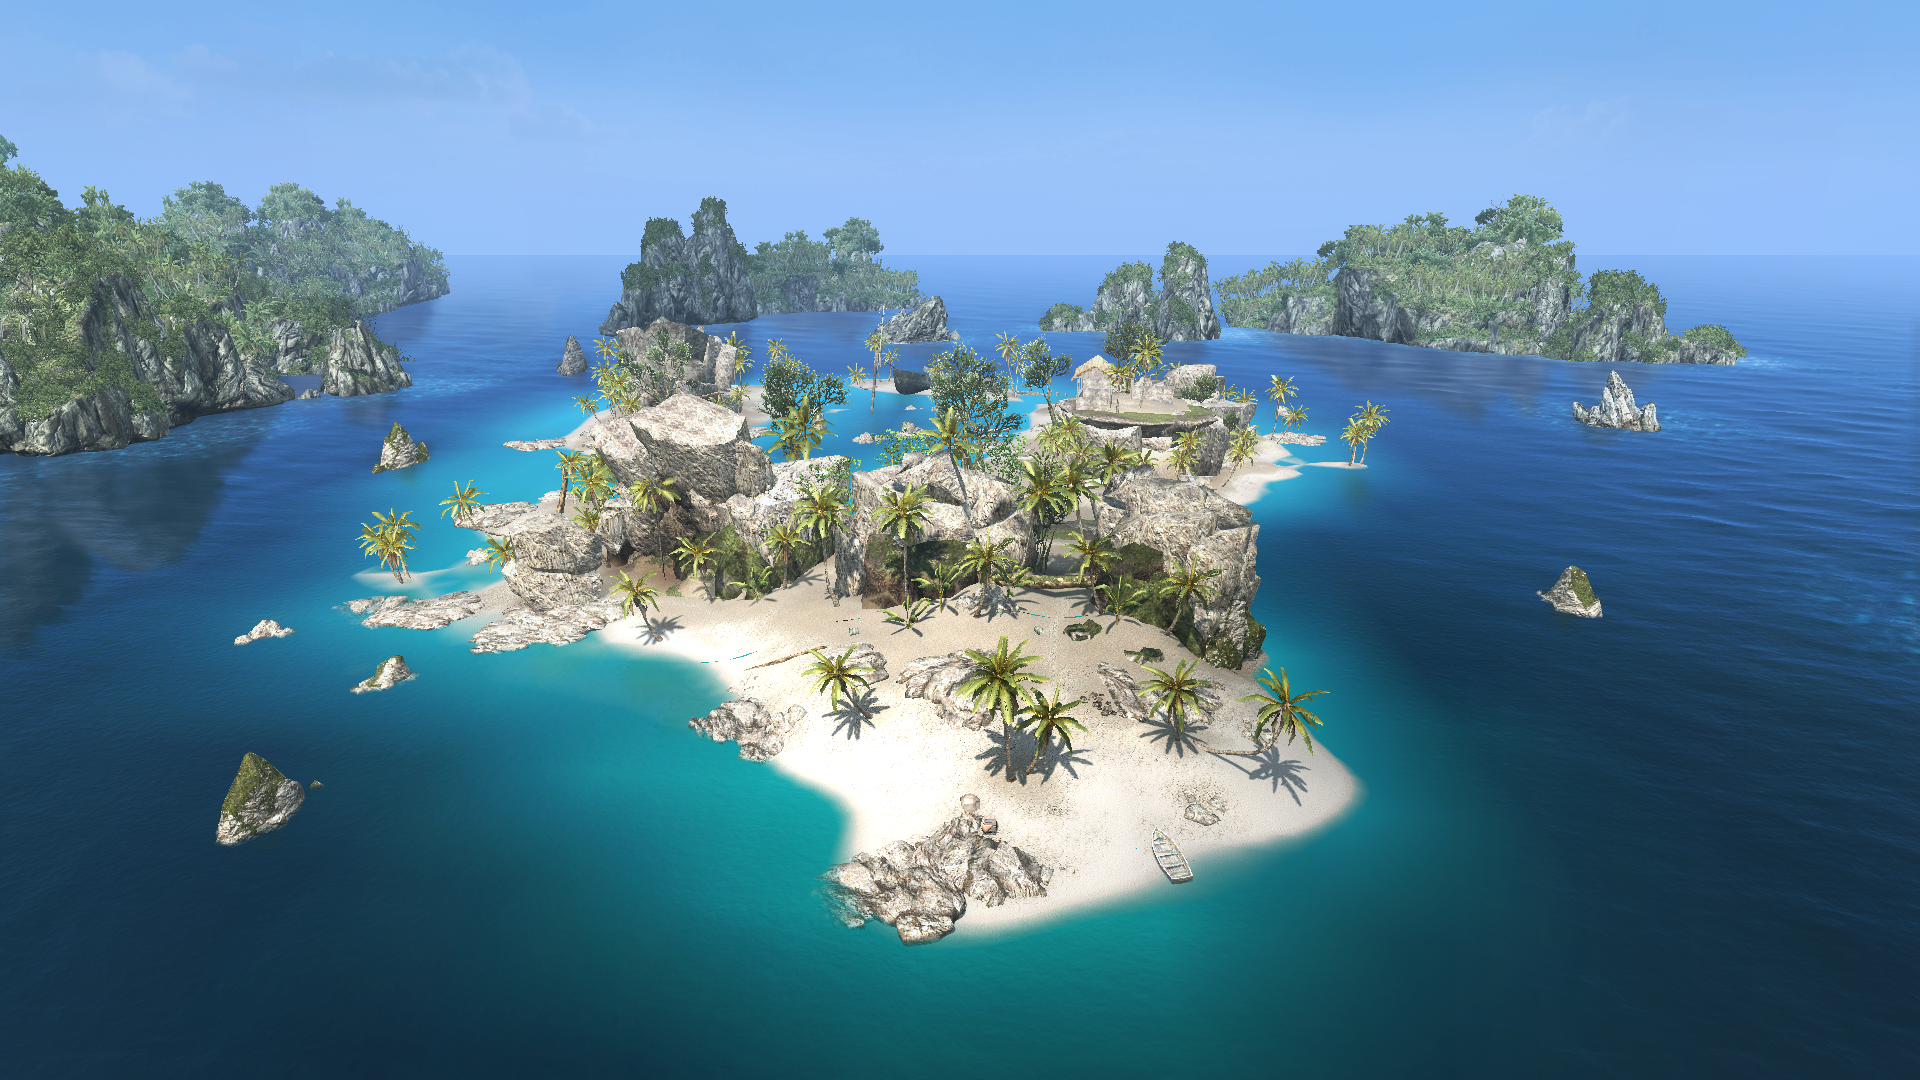 Mysterious Islands Tv